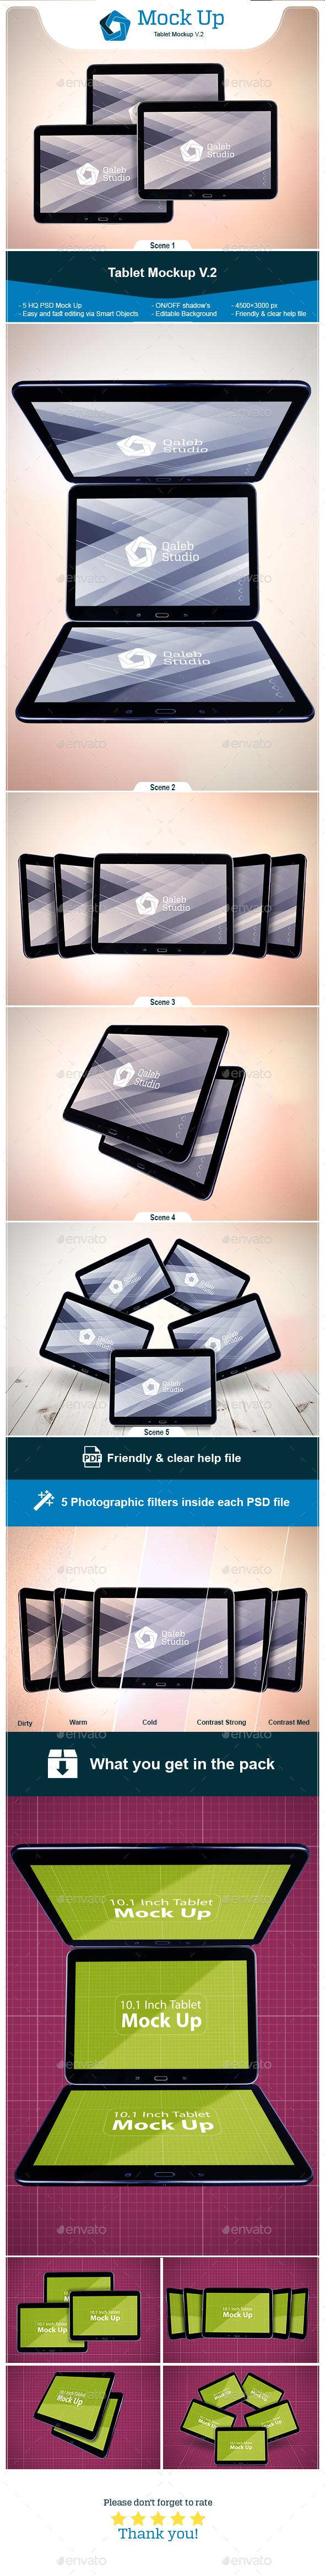 Tablet Mockup V.2 - Miscellaneous Print